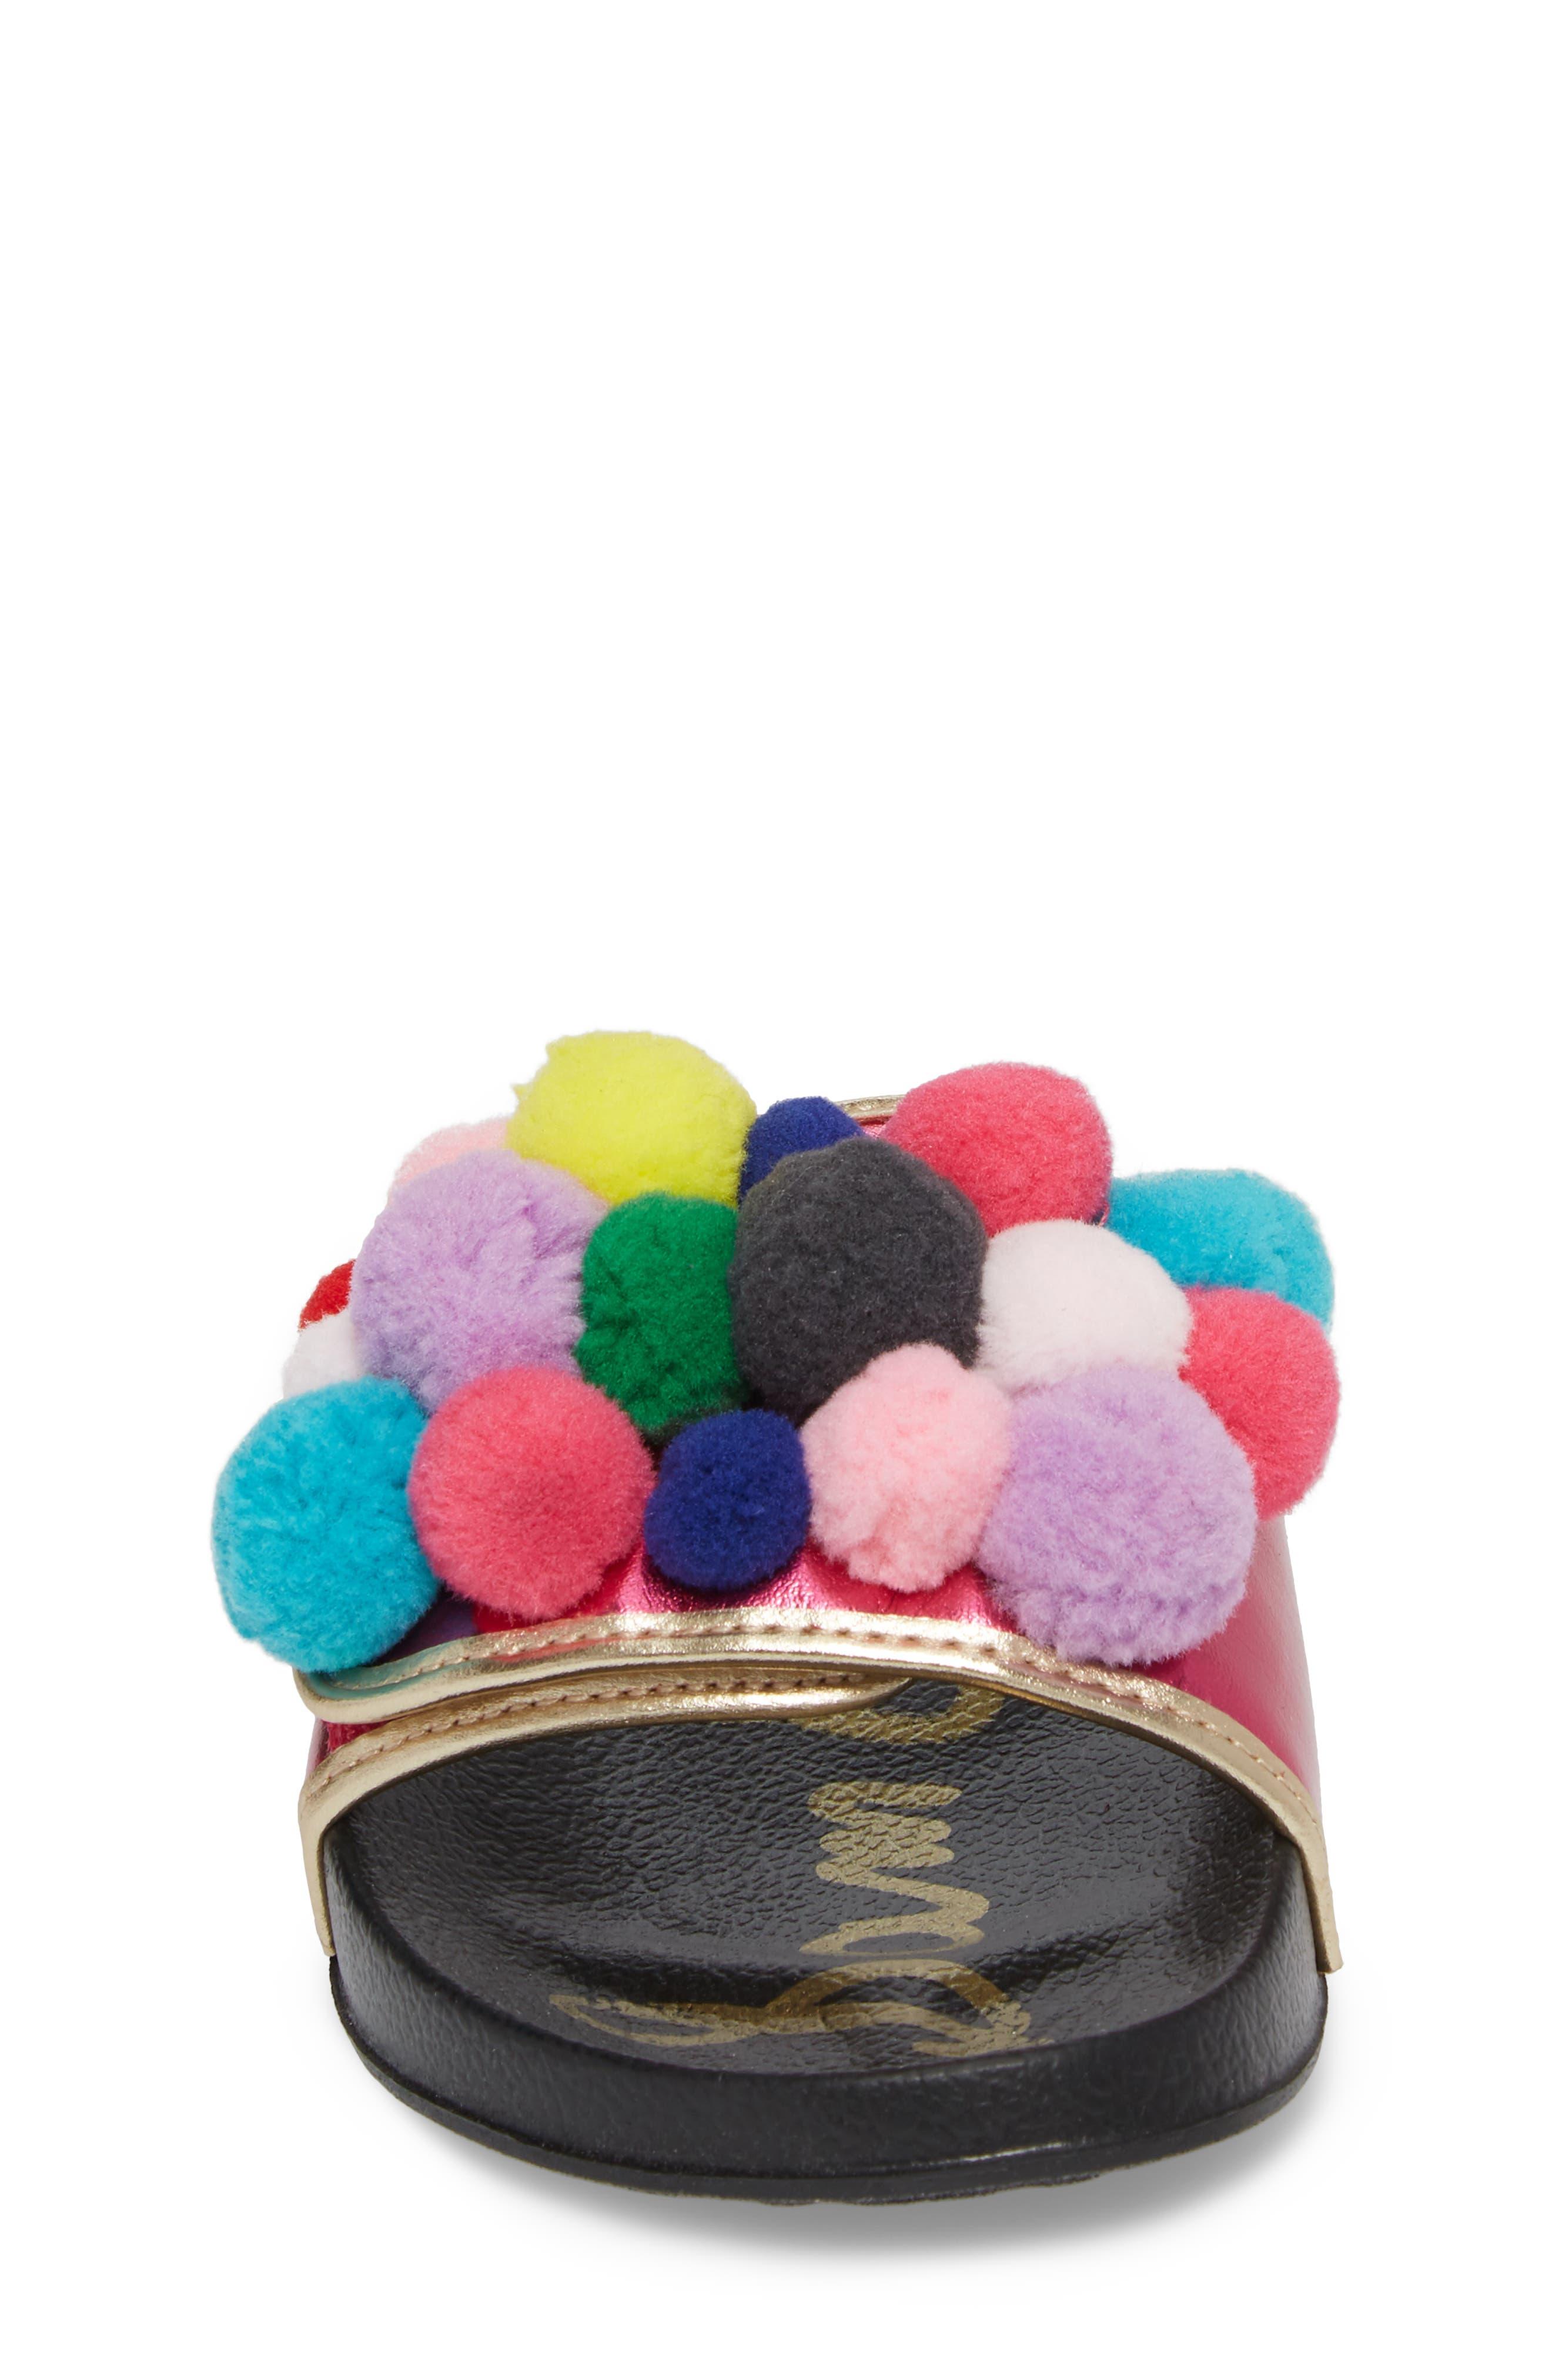 Faux Fur Mackie Cayman Sandal,                             Alternate thumbnail 4, color,                             Hot Pink Multi